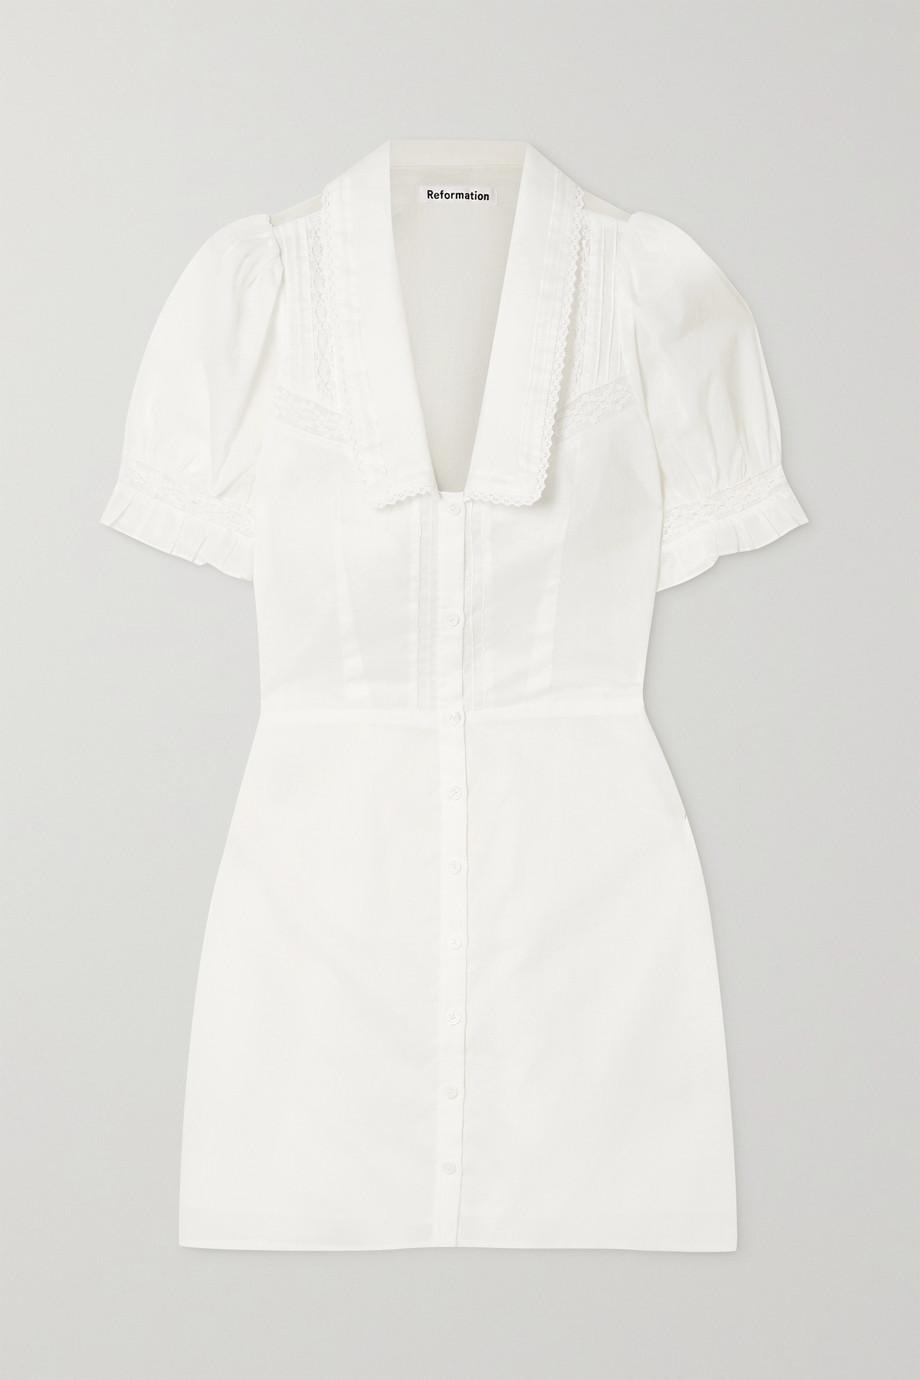 Reformation + NET SUSTAIN Jack lace-trimmed organic cotton-voile mini dress